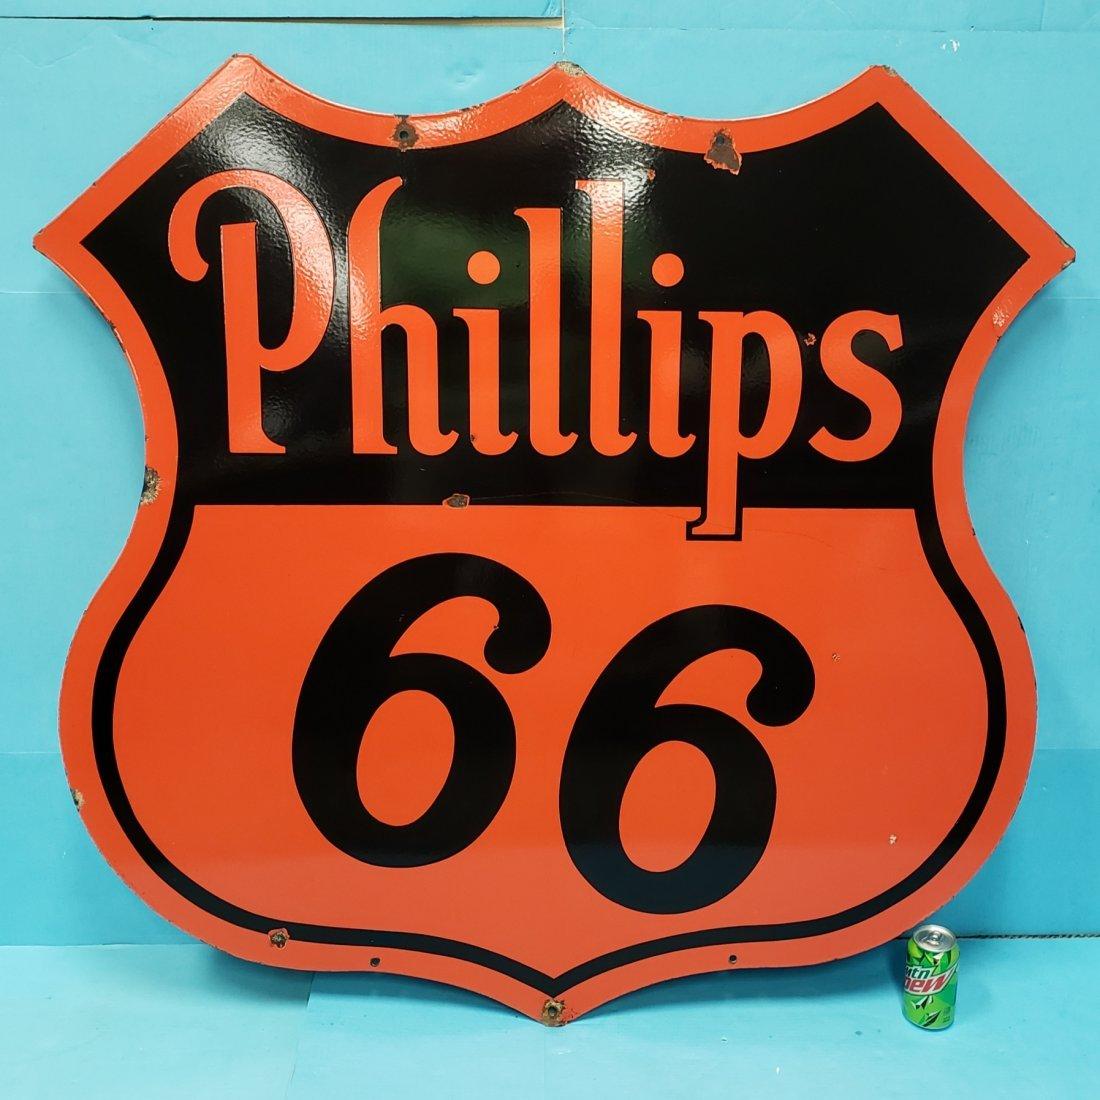 Porcelain Phillips 66 Double Sided Dealership Sign